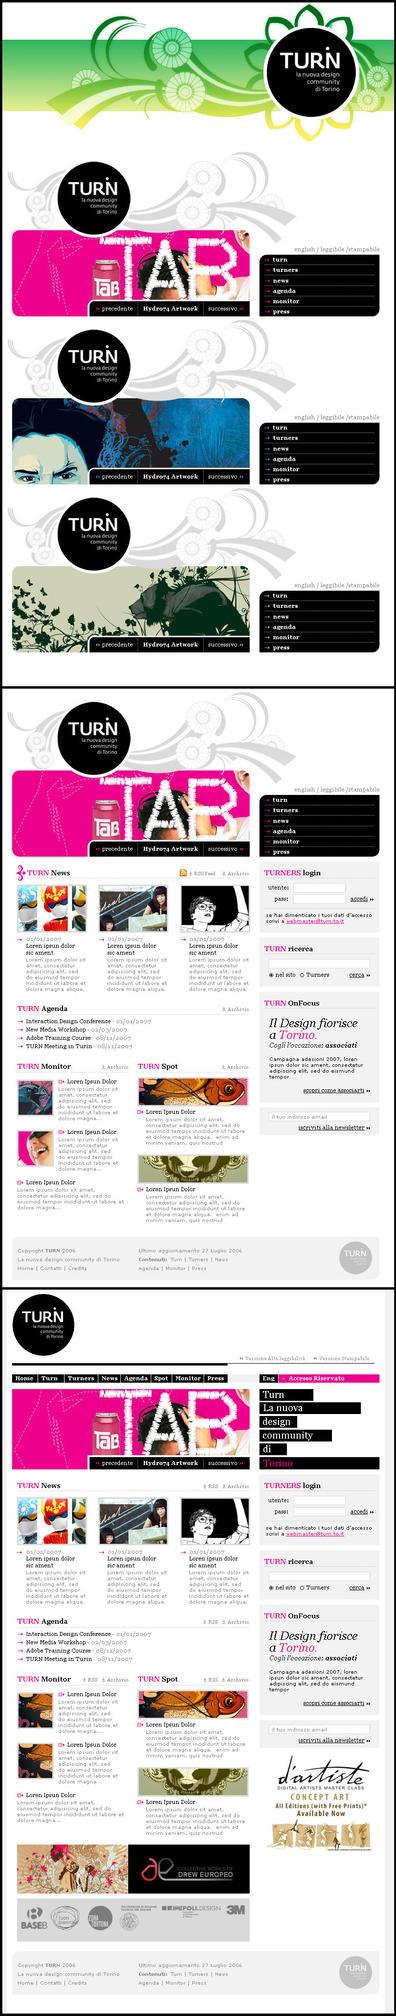 TURN Homepage v2.0 by insanedesign